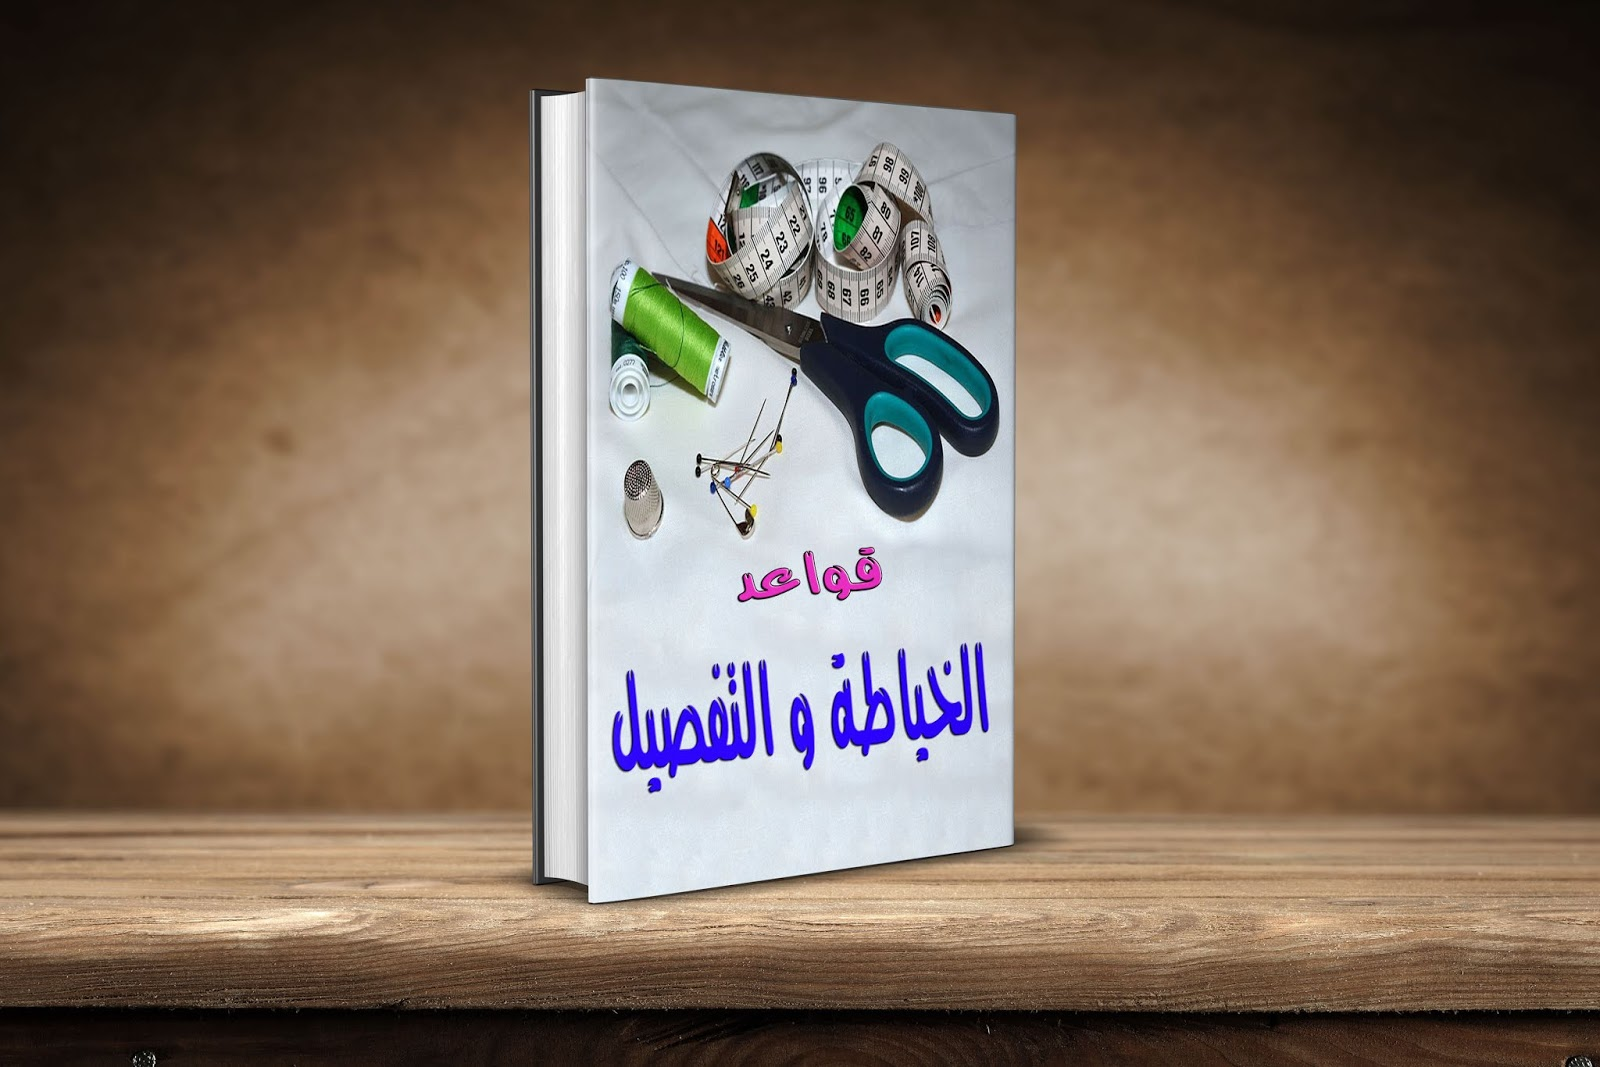 b478bedb05719 تحميل كتاب قواعد الخياطة و التفصيل للمبتدئين من الصفر حتى الاحتراف